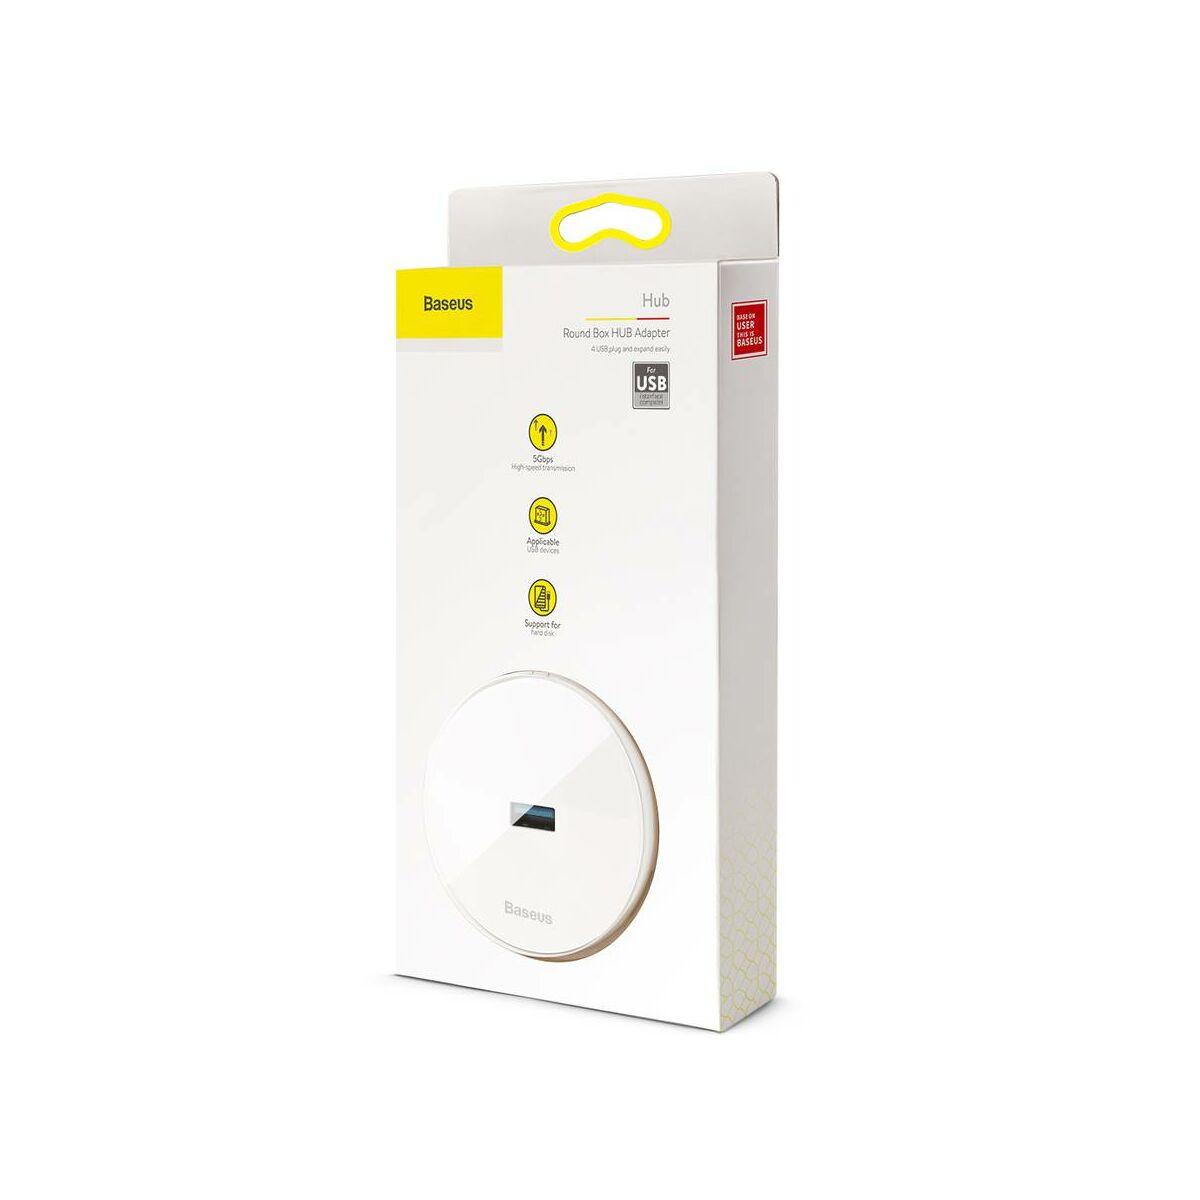 Baseus HUB, Round box (USB bemenetről - 1xUSB3.0 + 3xUSB2.0) adapter, fehér (CAHUB-F02)